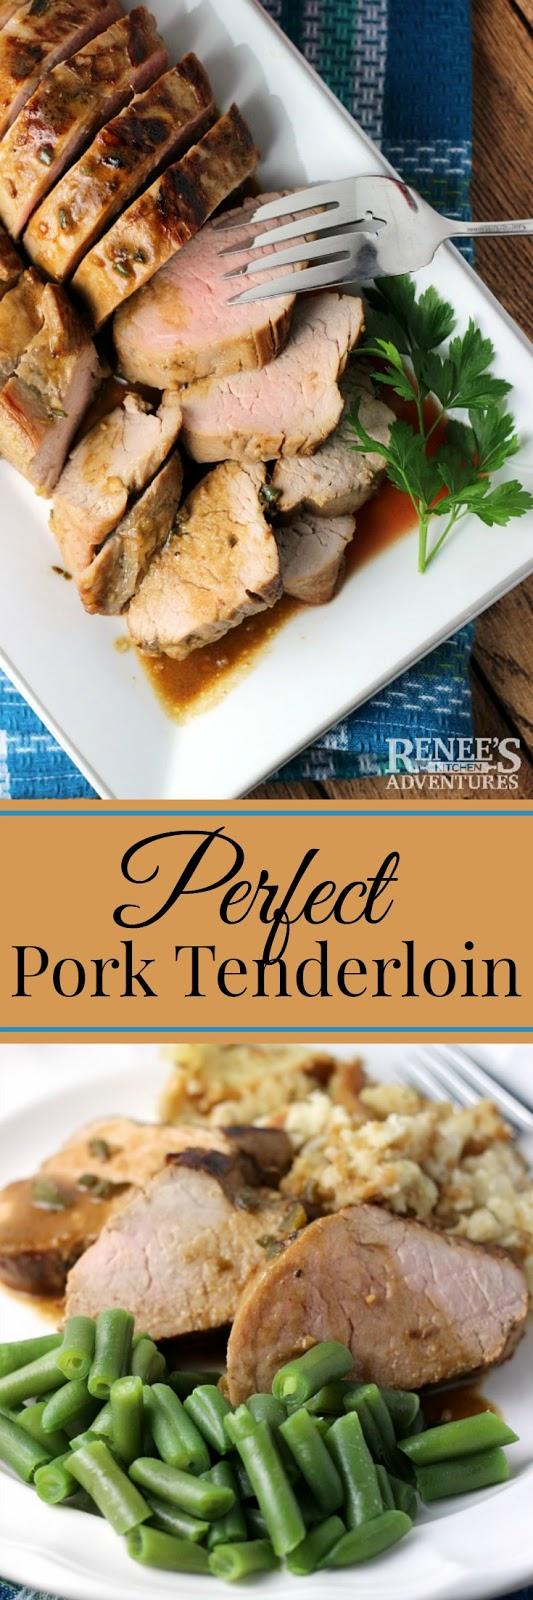 Perfect Pork Tenderloin | Renee's Kitchen Adventures - easy pork tenderloin recipe cooked to perfection. Makes a great weeknight dinner idea. #OhioPork